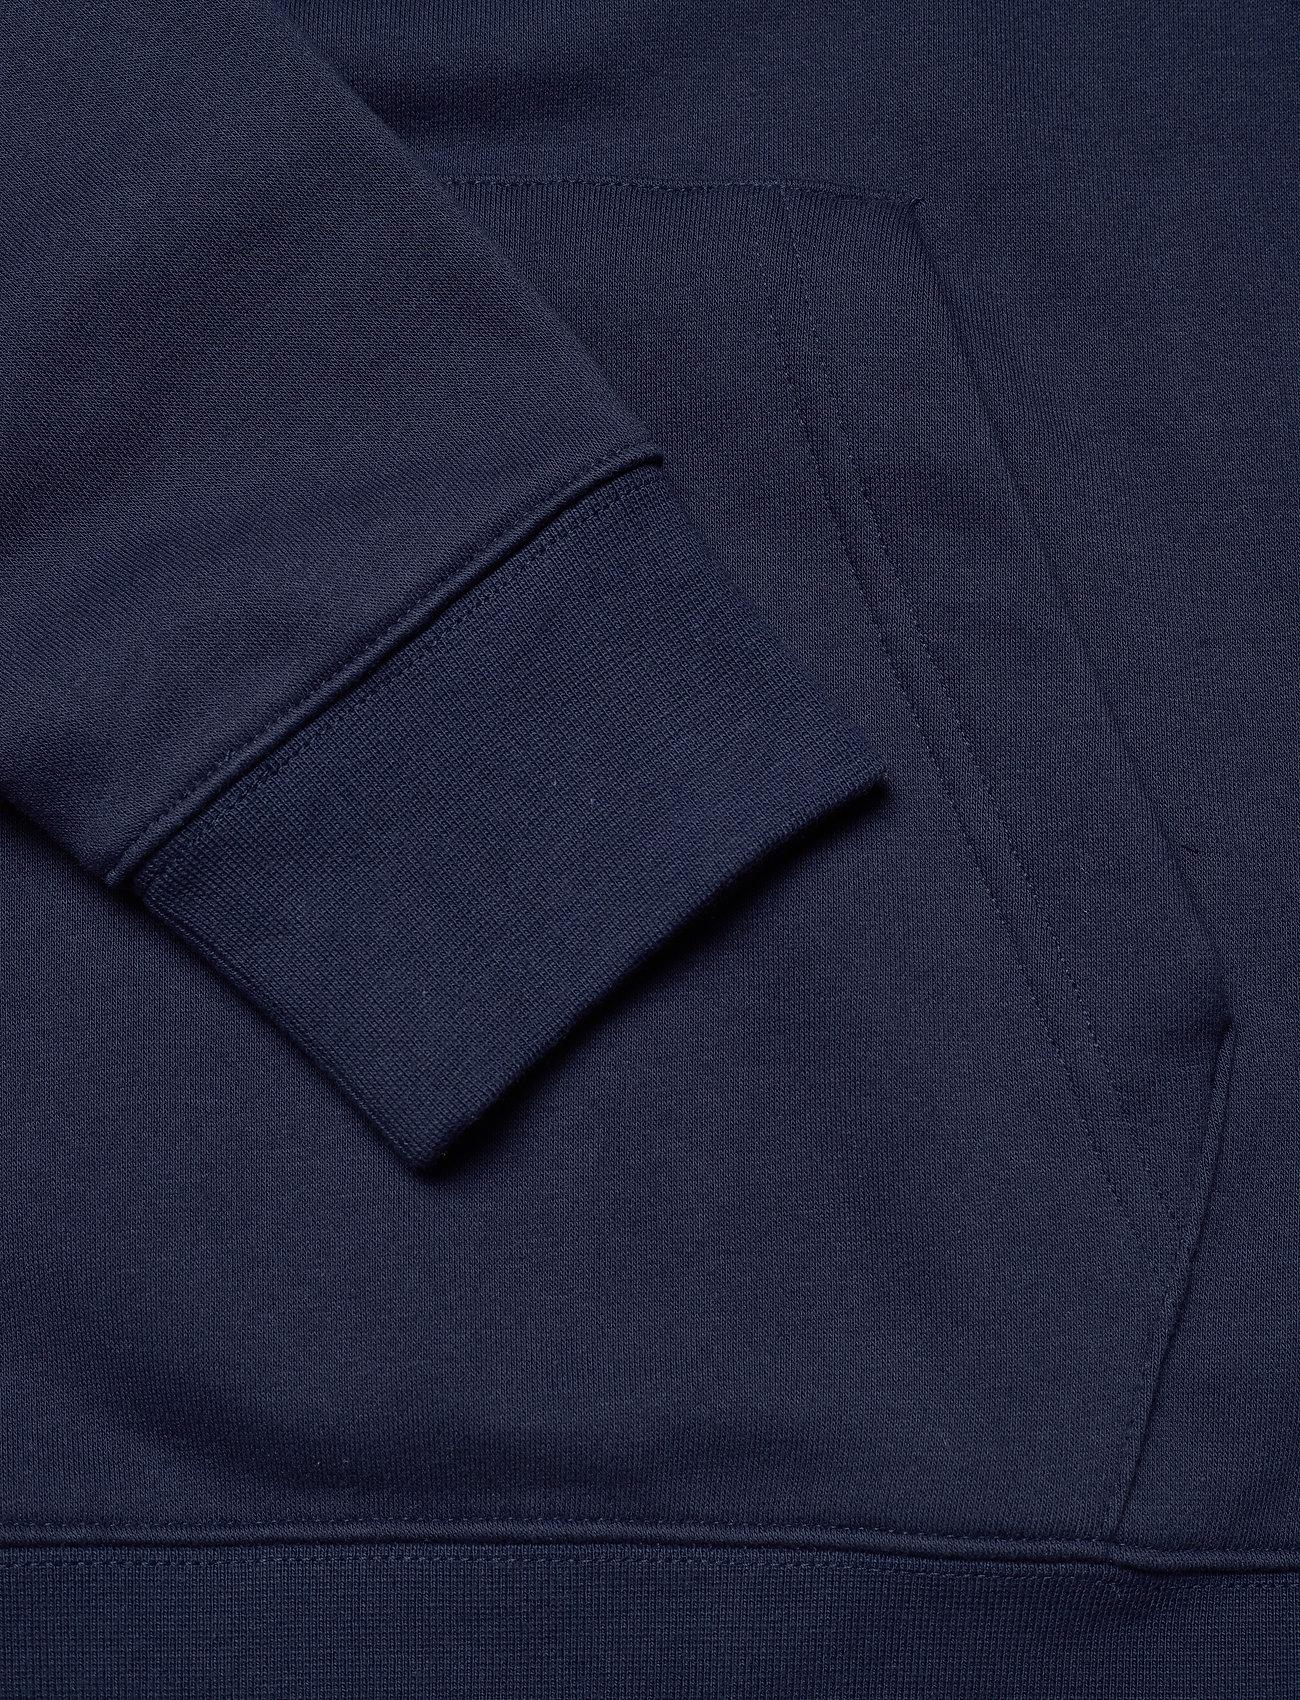 NIKE Fan Gear Dallas Cowboys Nike Local Club Fleece Hoodie - Sweatshirts COLLEGE NAVY - Menn Klær